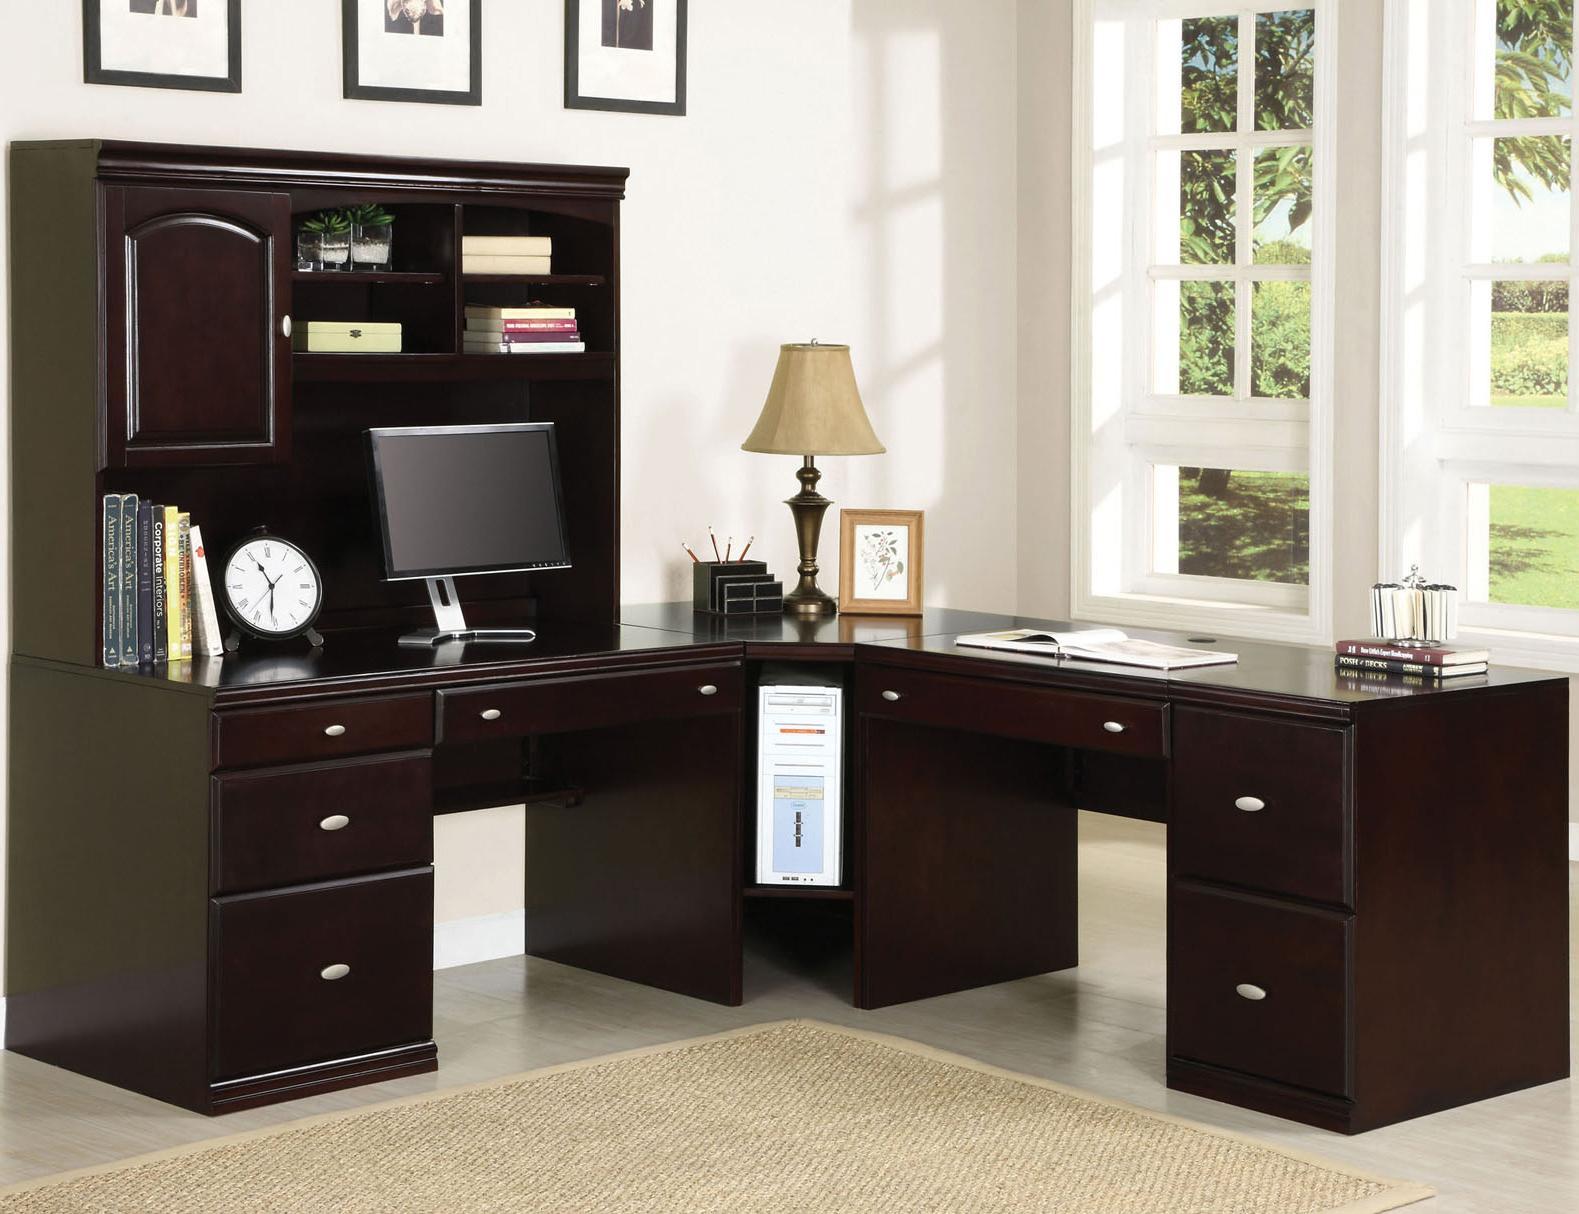 Acme Furniture Cape Corner Desk - Item Number: 92031+33+34+35+30